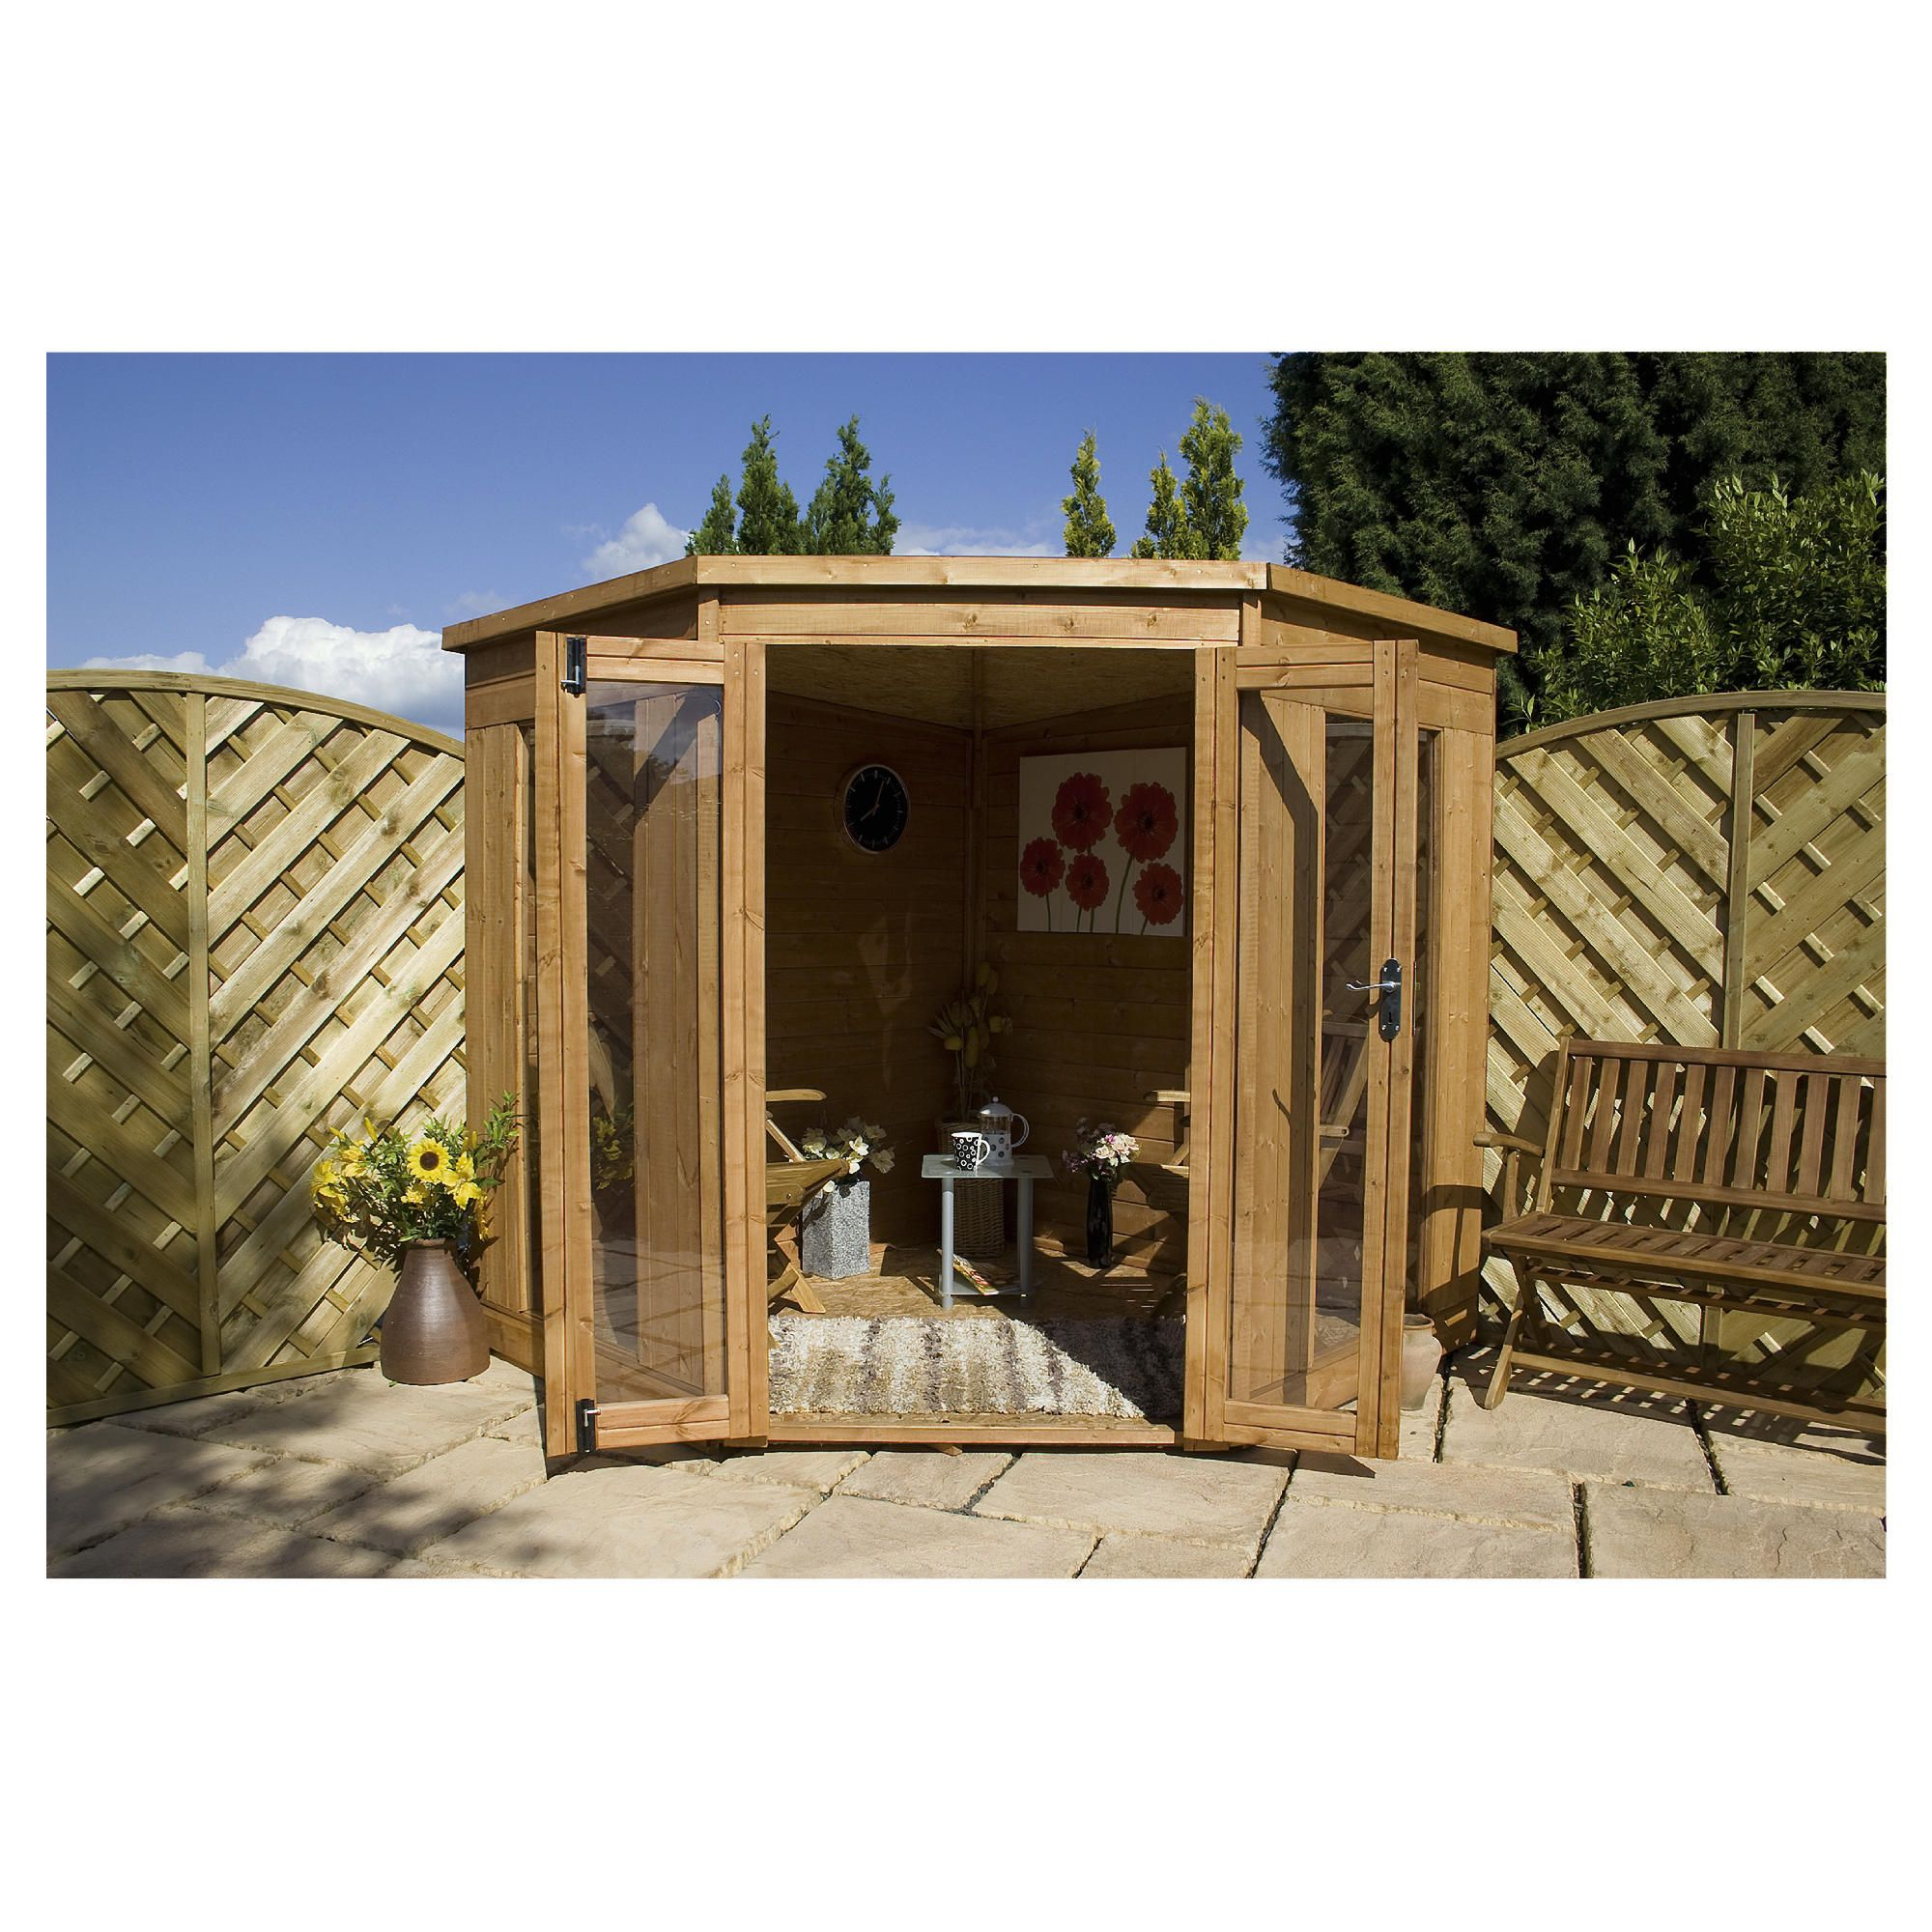 Mercia 8x8 Corner Summerhouse with installation at Tesco Direct